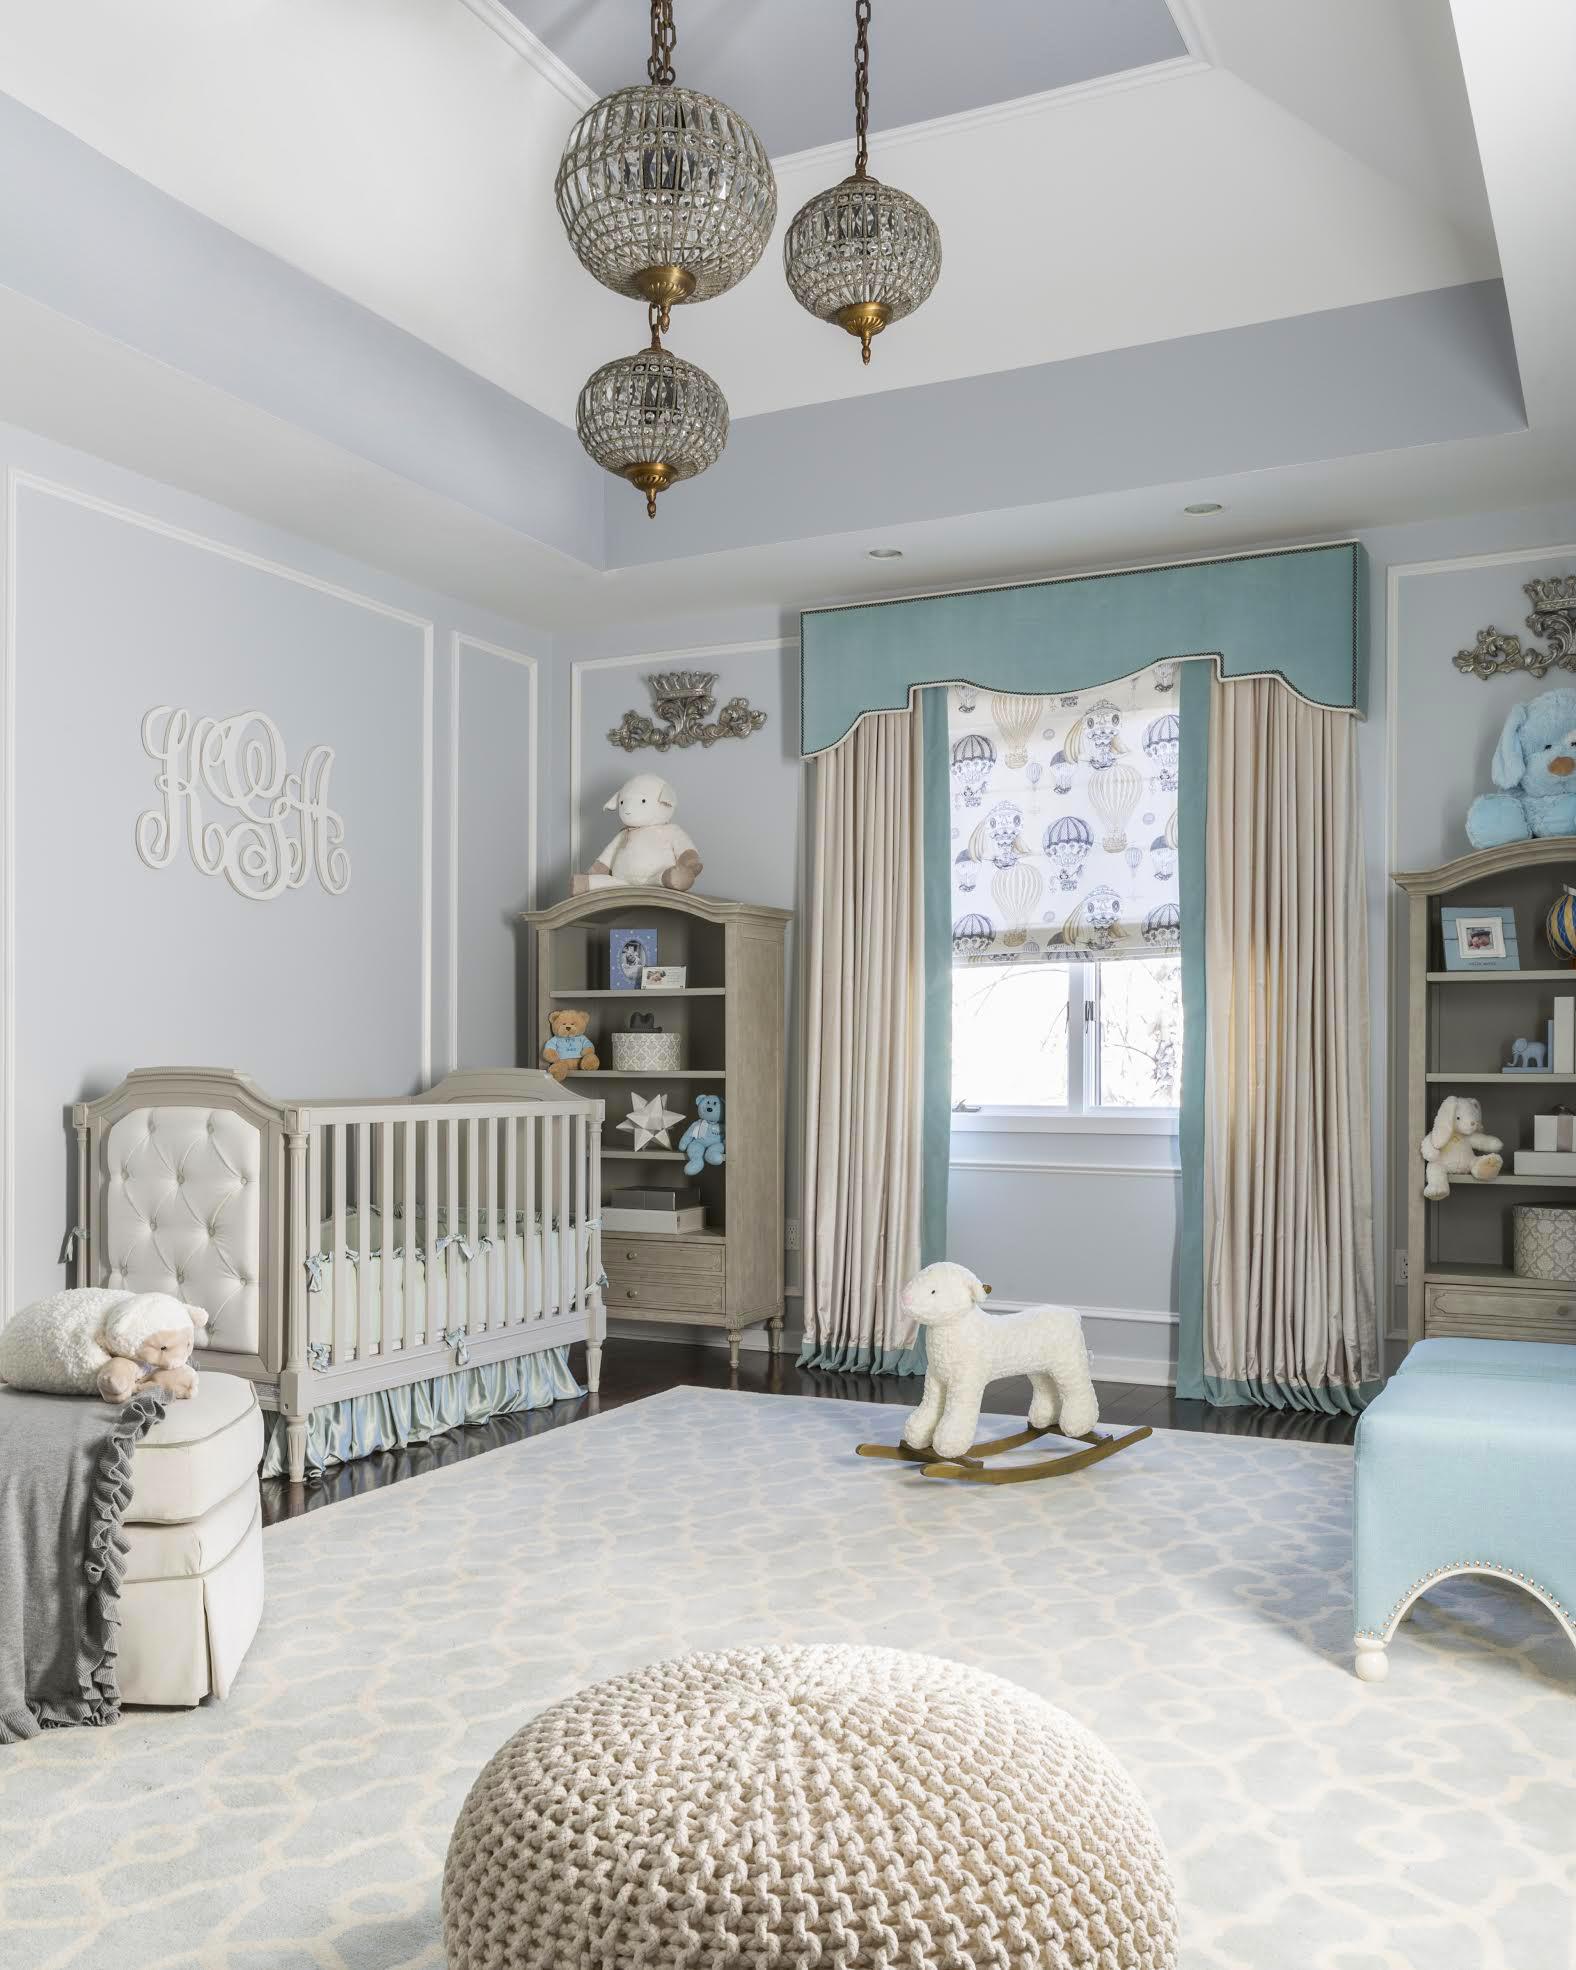 Luxury Baby Boy Rooms: Project Nursery